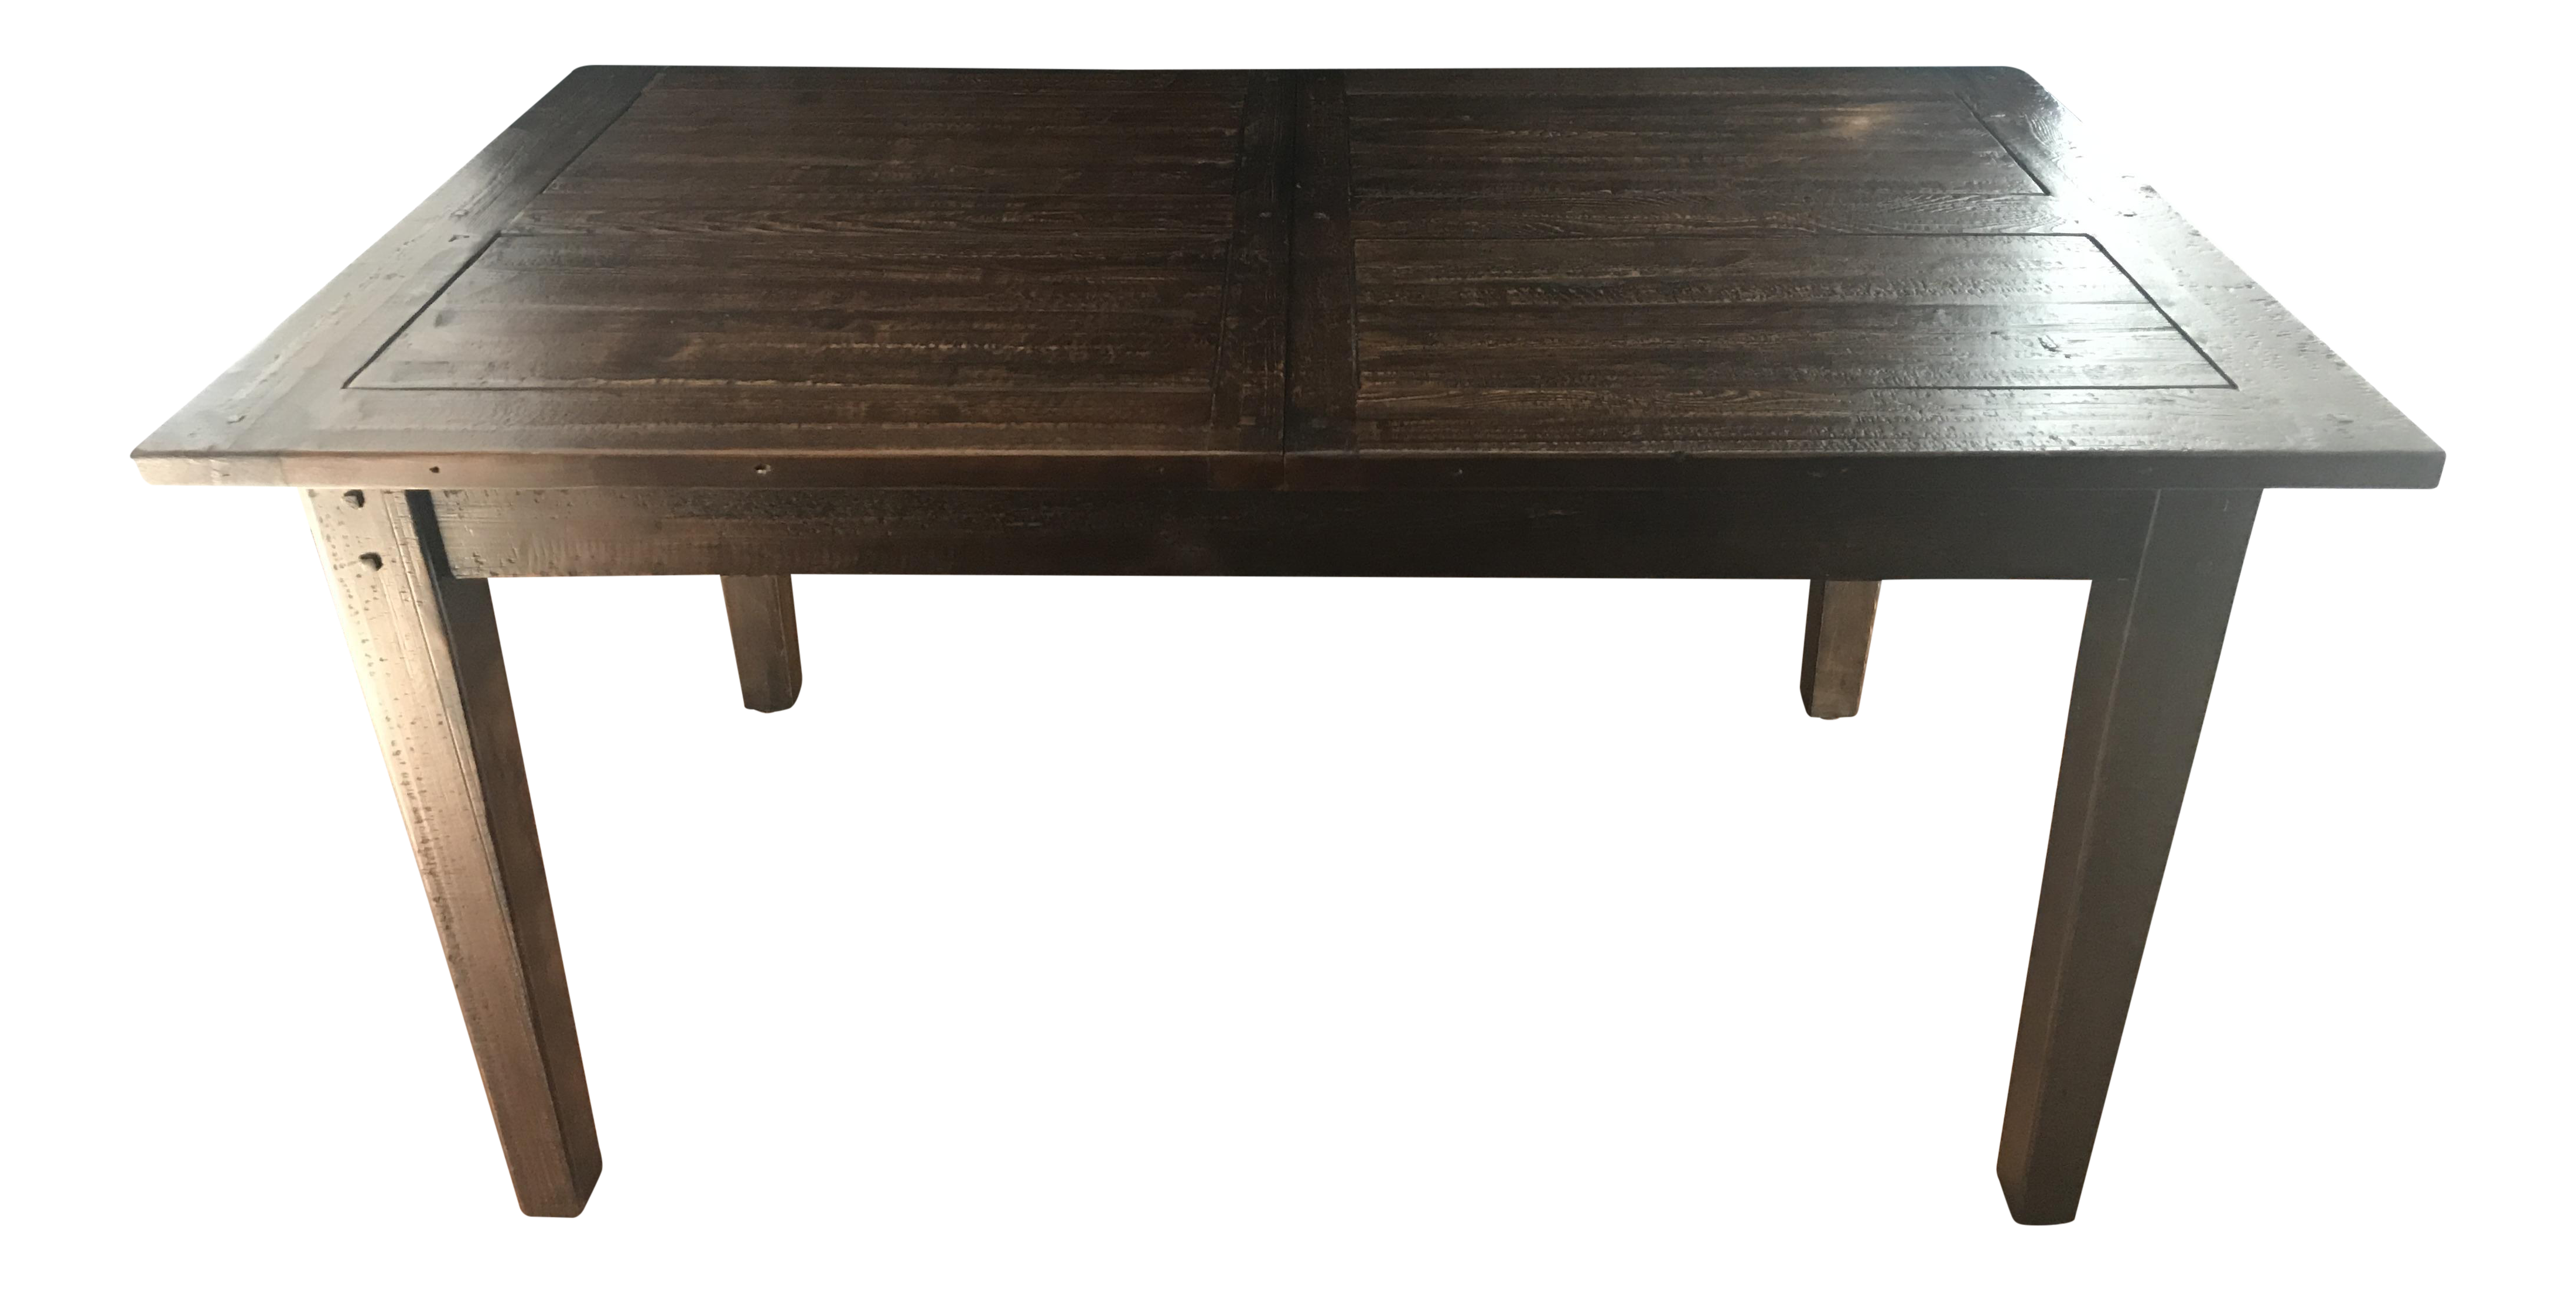 Restoration hardware 1900s boulangerie rectangular for 7 foot dining room table